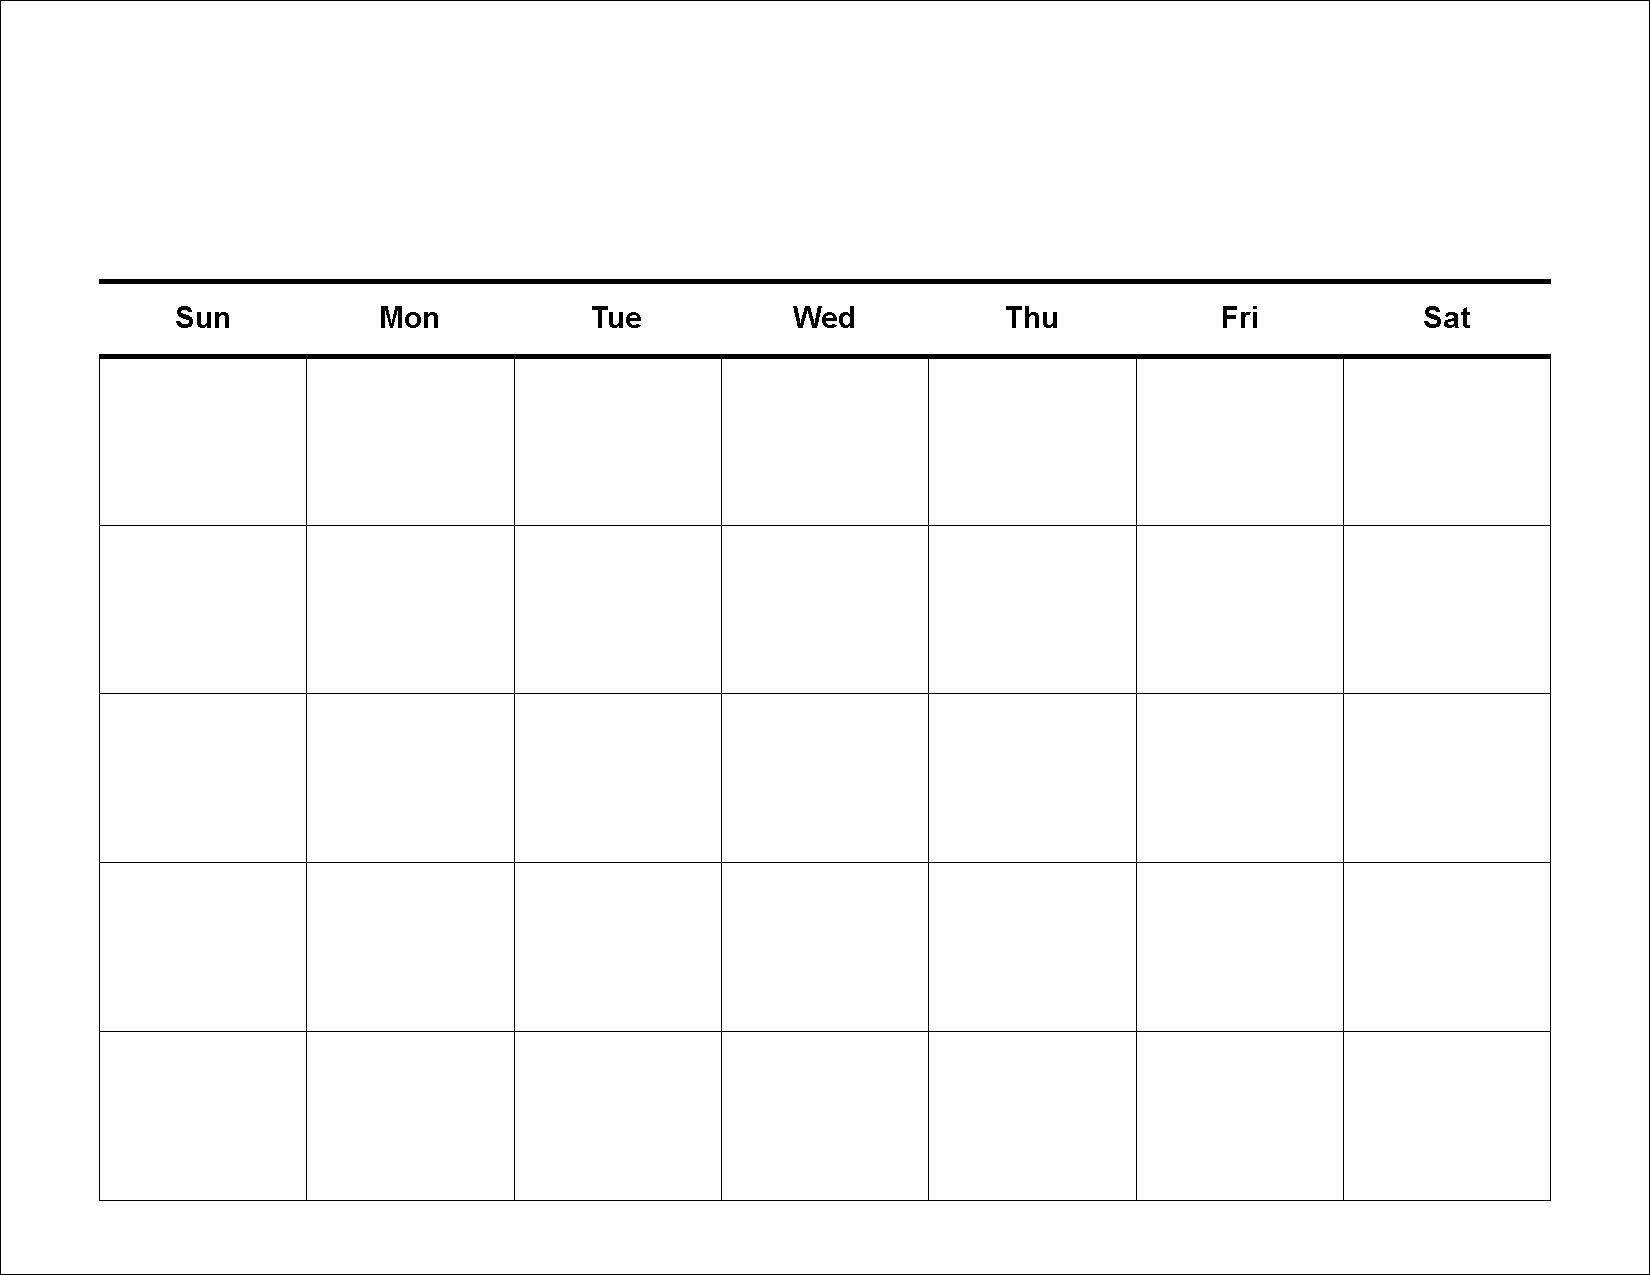 Printable Calendar Grid Leonescapersco Free 2 Week Blank throughout 1 Week Blank Calendar Free Printable